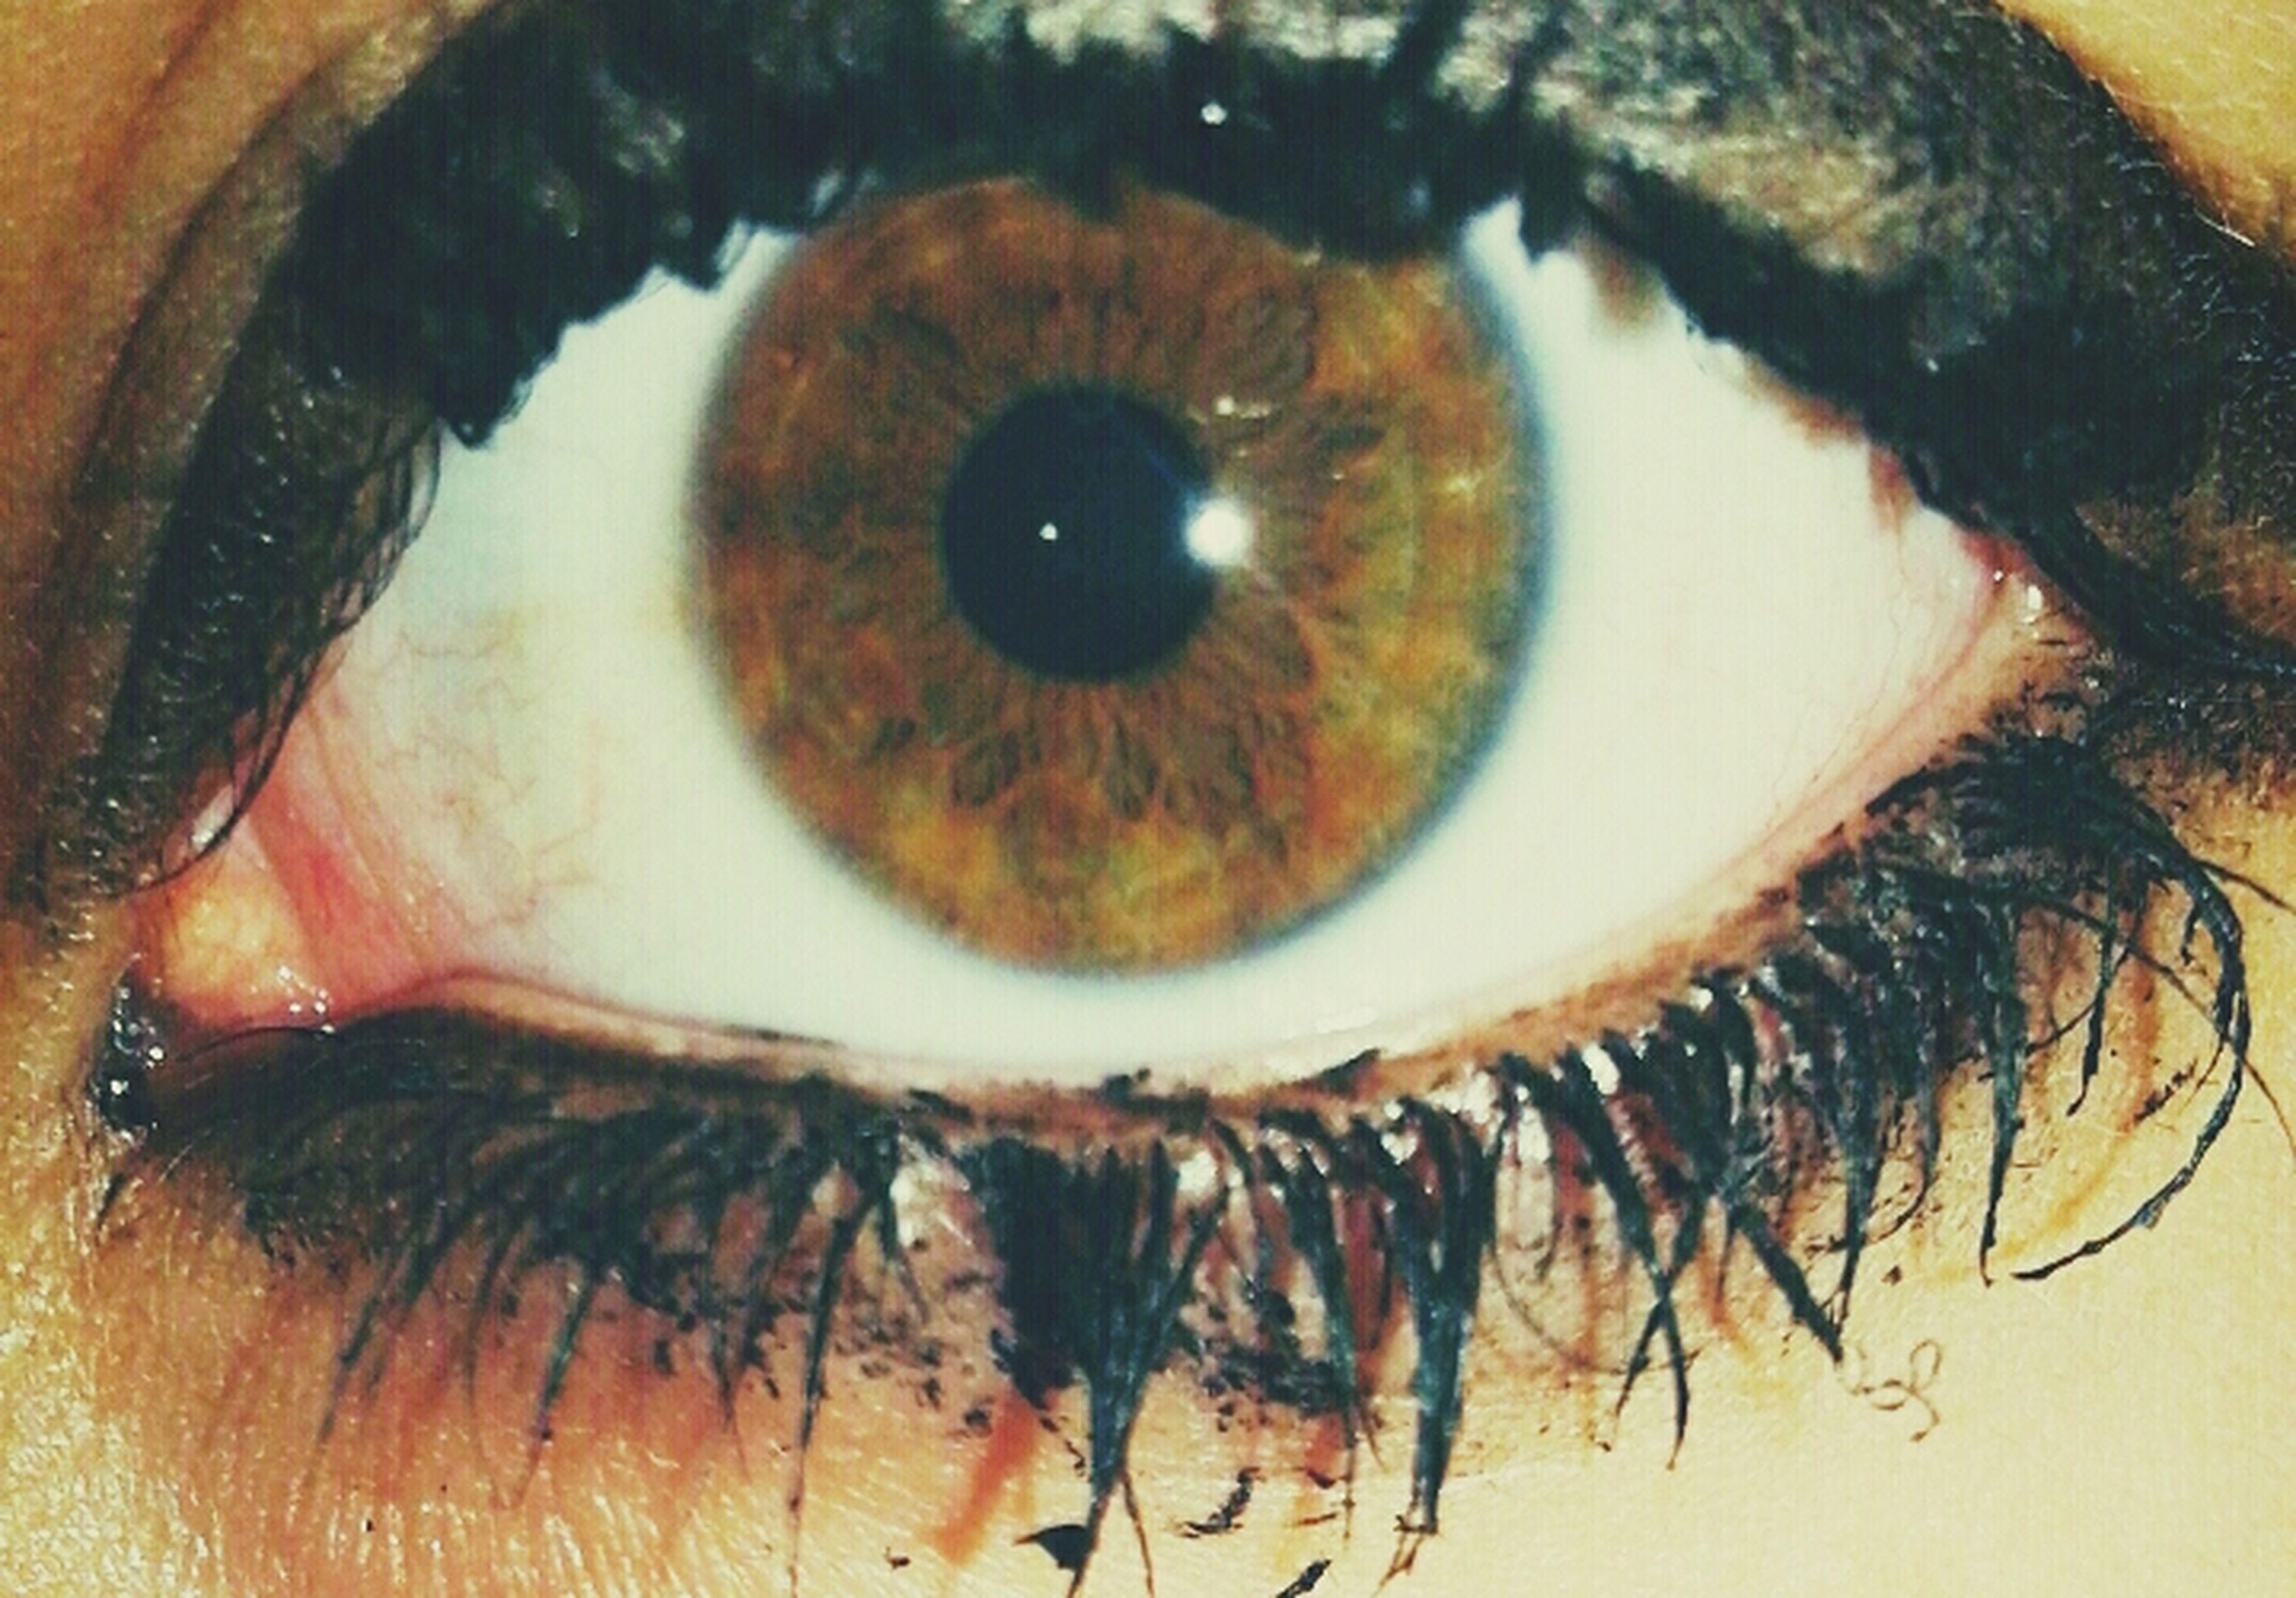 indoors, human eye, close-up, eyesight, looking at camera, eyelash, portrait, part of, lifestyles, extreme close-up, sensory perception, front view, human face, person, headshot, human skin, leisure activity